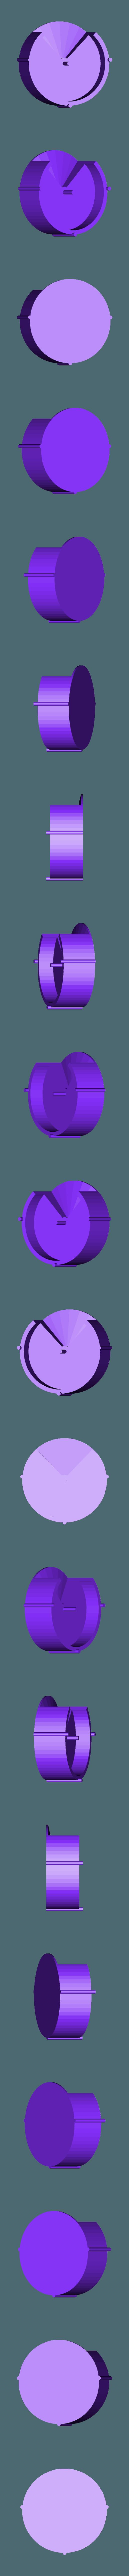 Dispenser Base.stl Download free STL file Jelly Bean Dispenser • 3D printer template, Onyxia